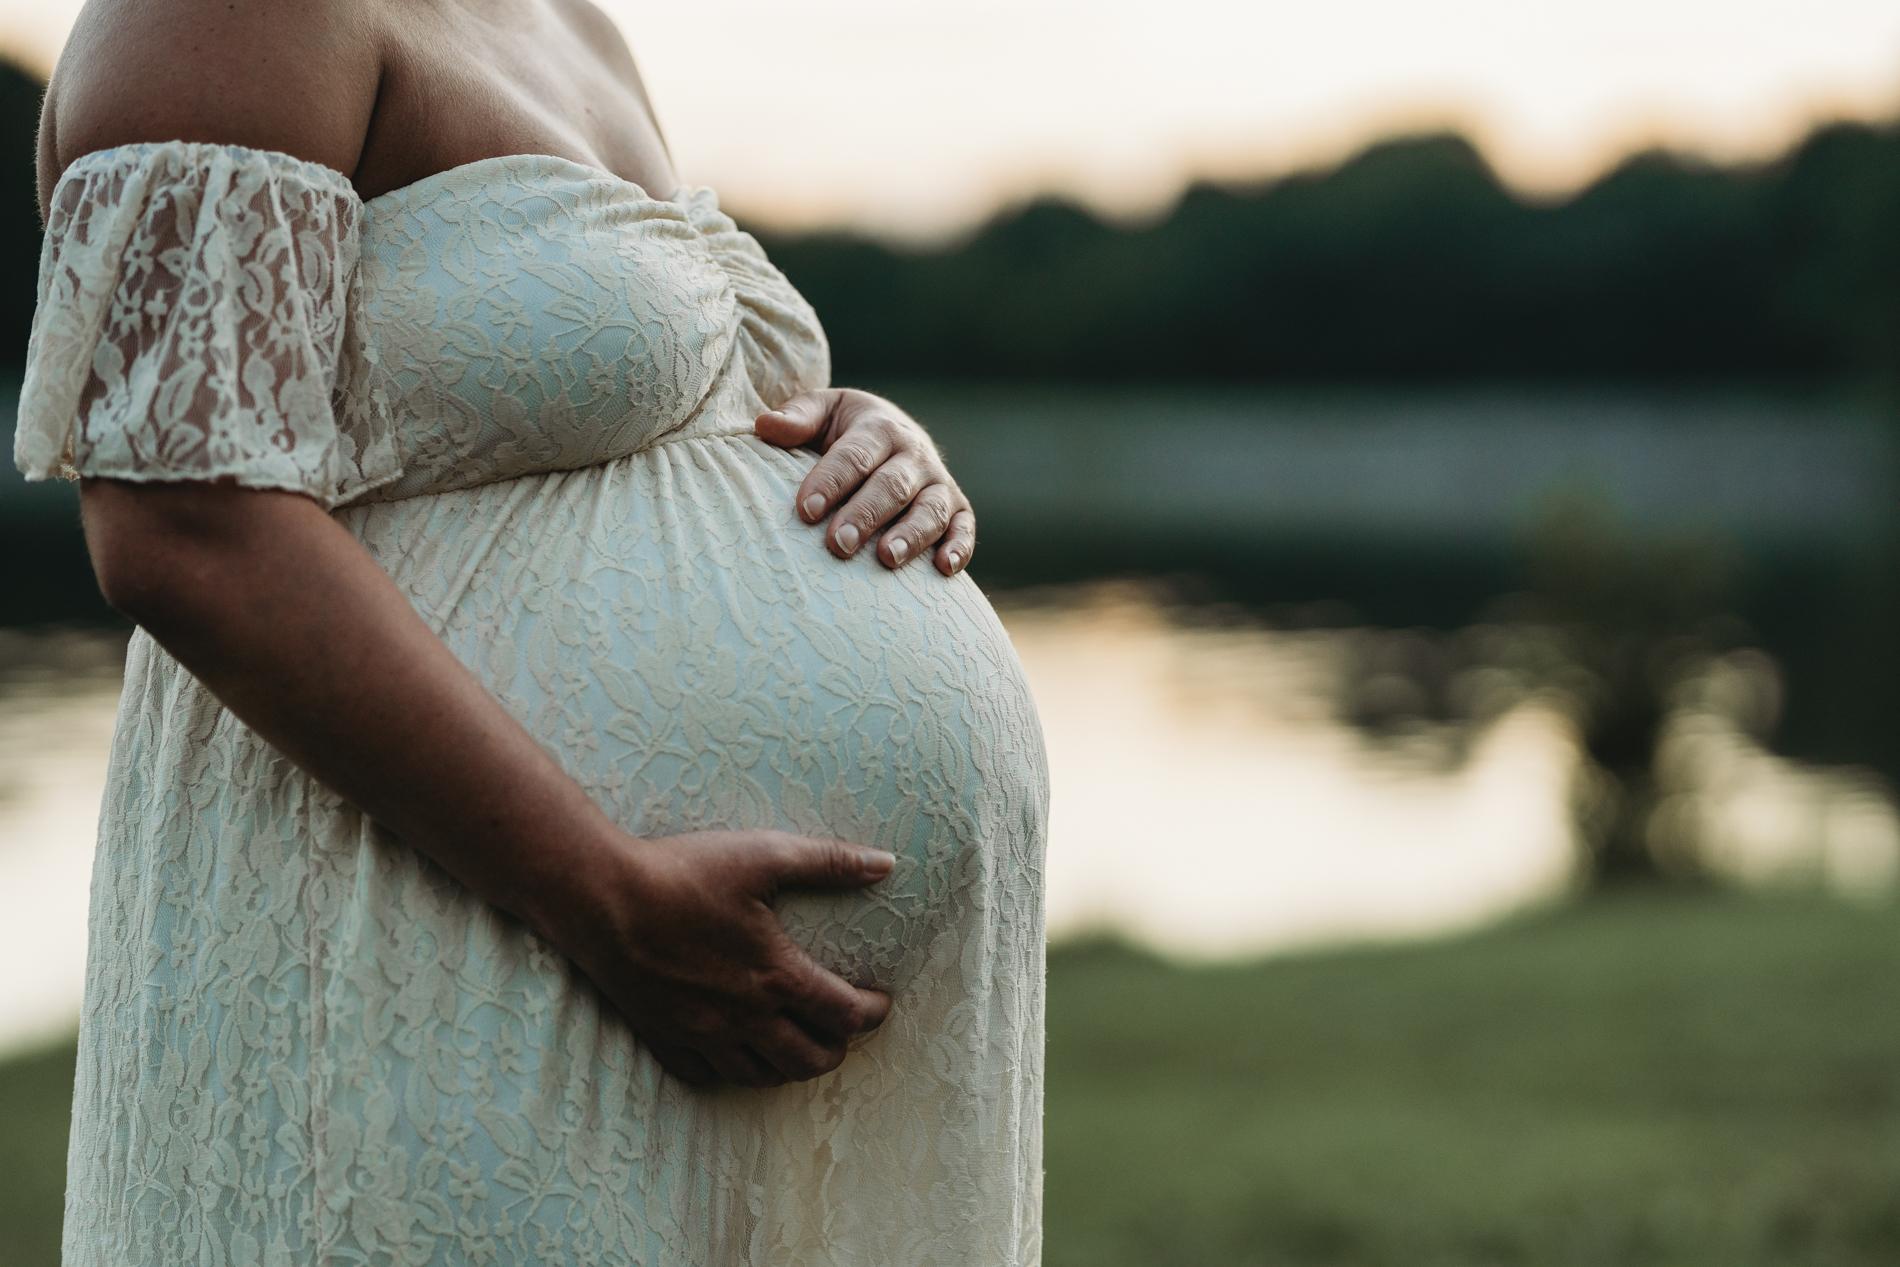 potomac maternity photographer pregnancy photograph